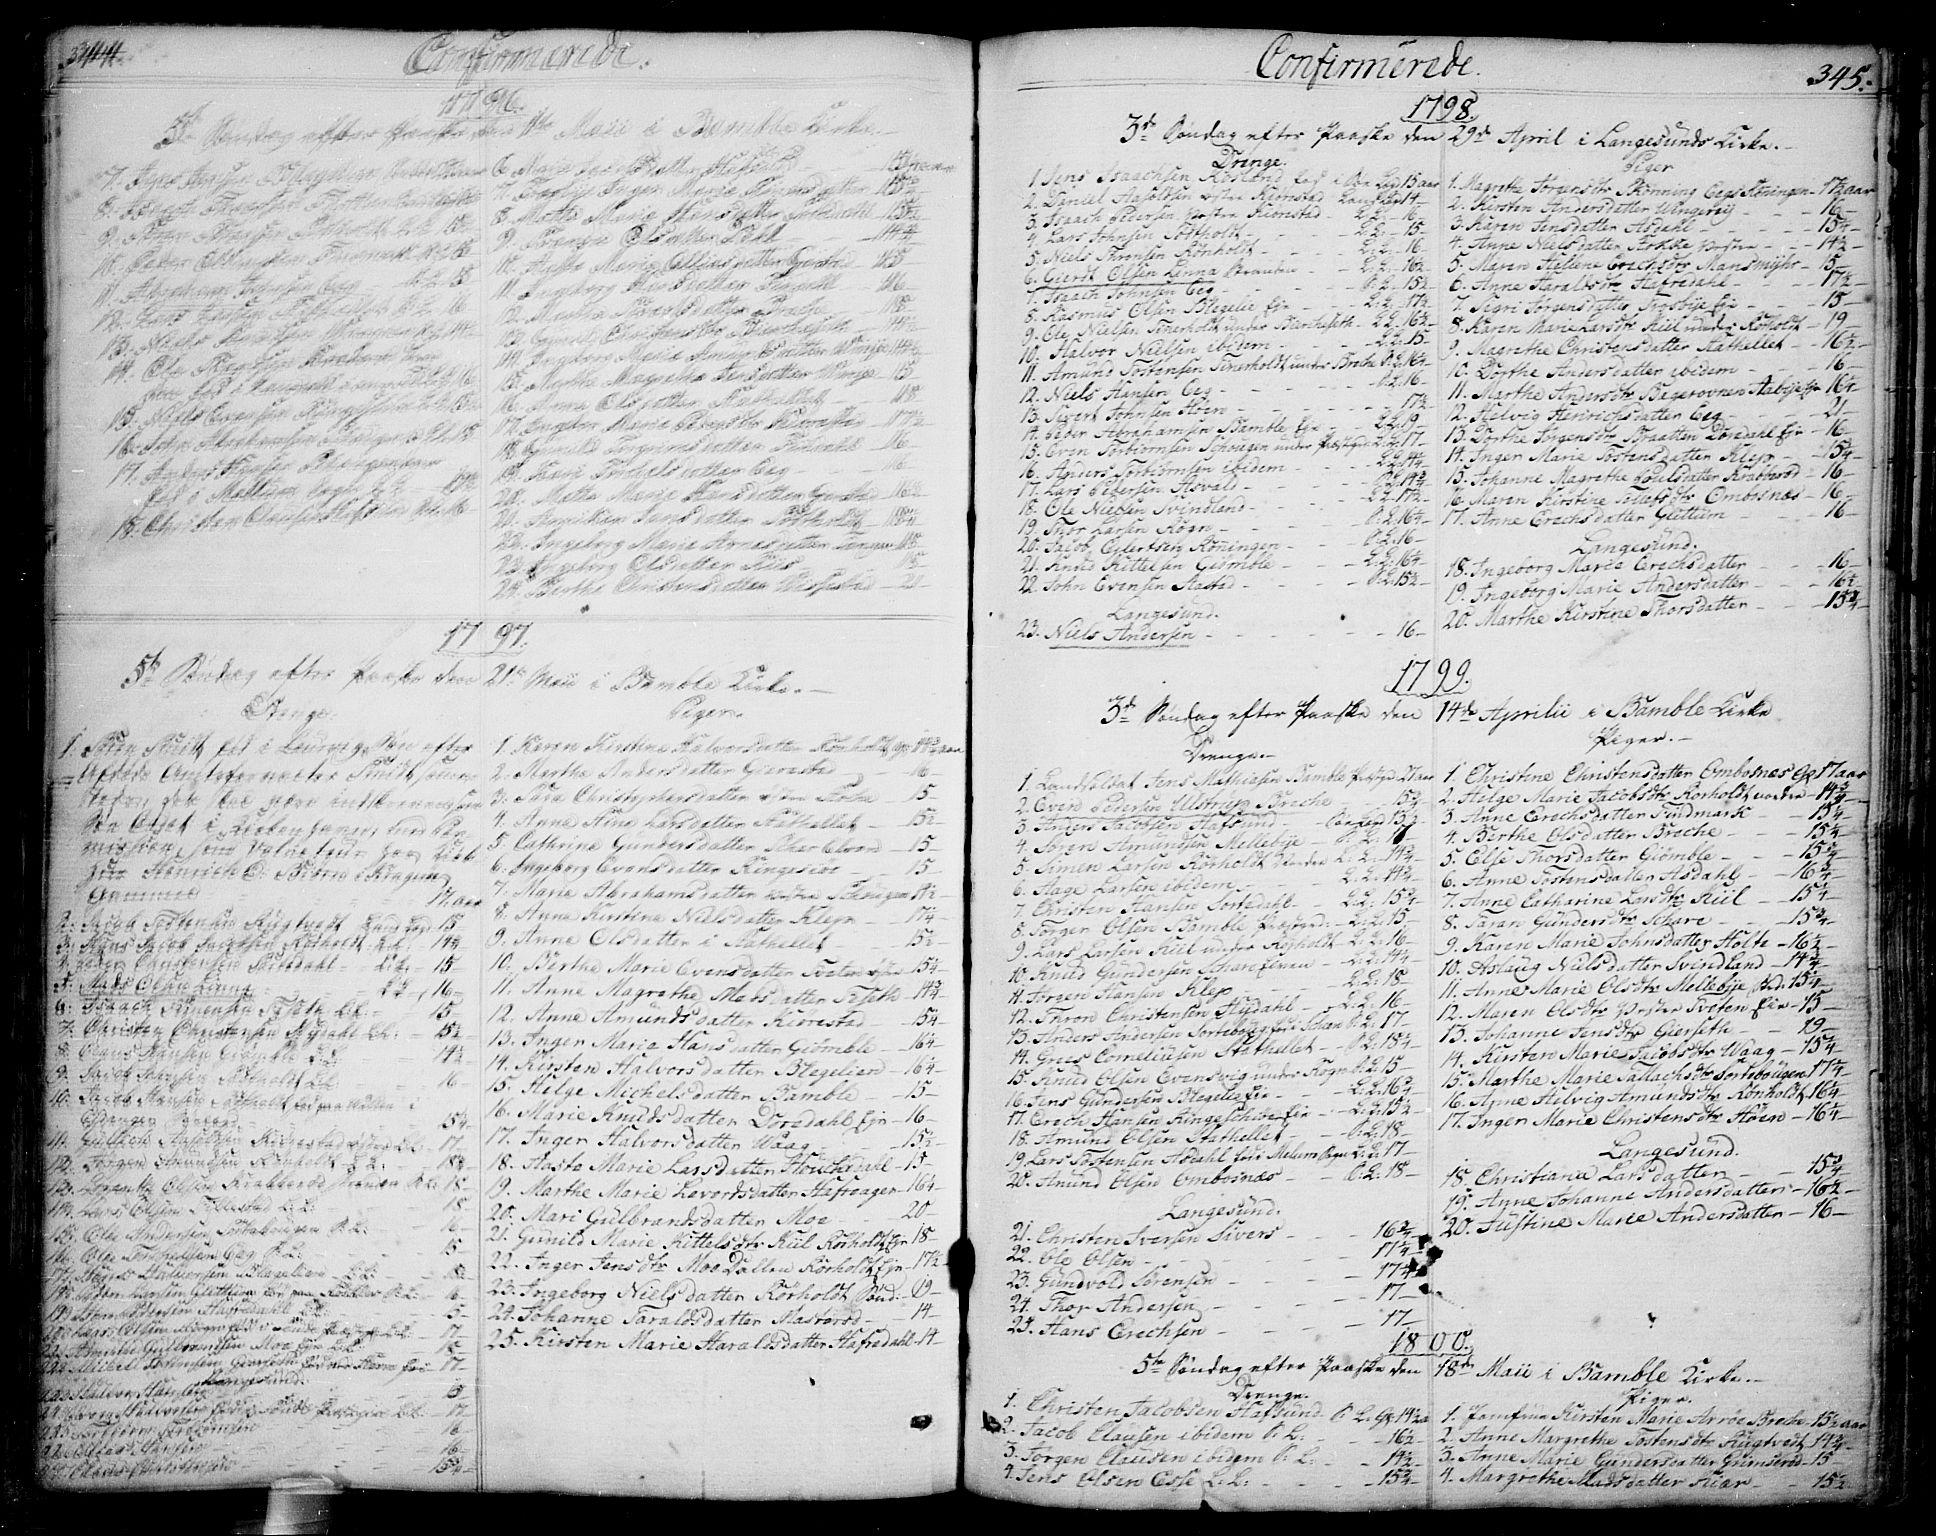 SAKO, Bamble kirkebøker, F/Fa/L0002: Ministerialbok nr. I 2, 1775-1814, s. 344-345